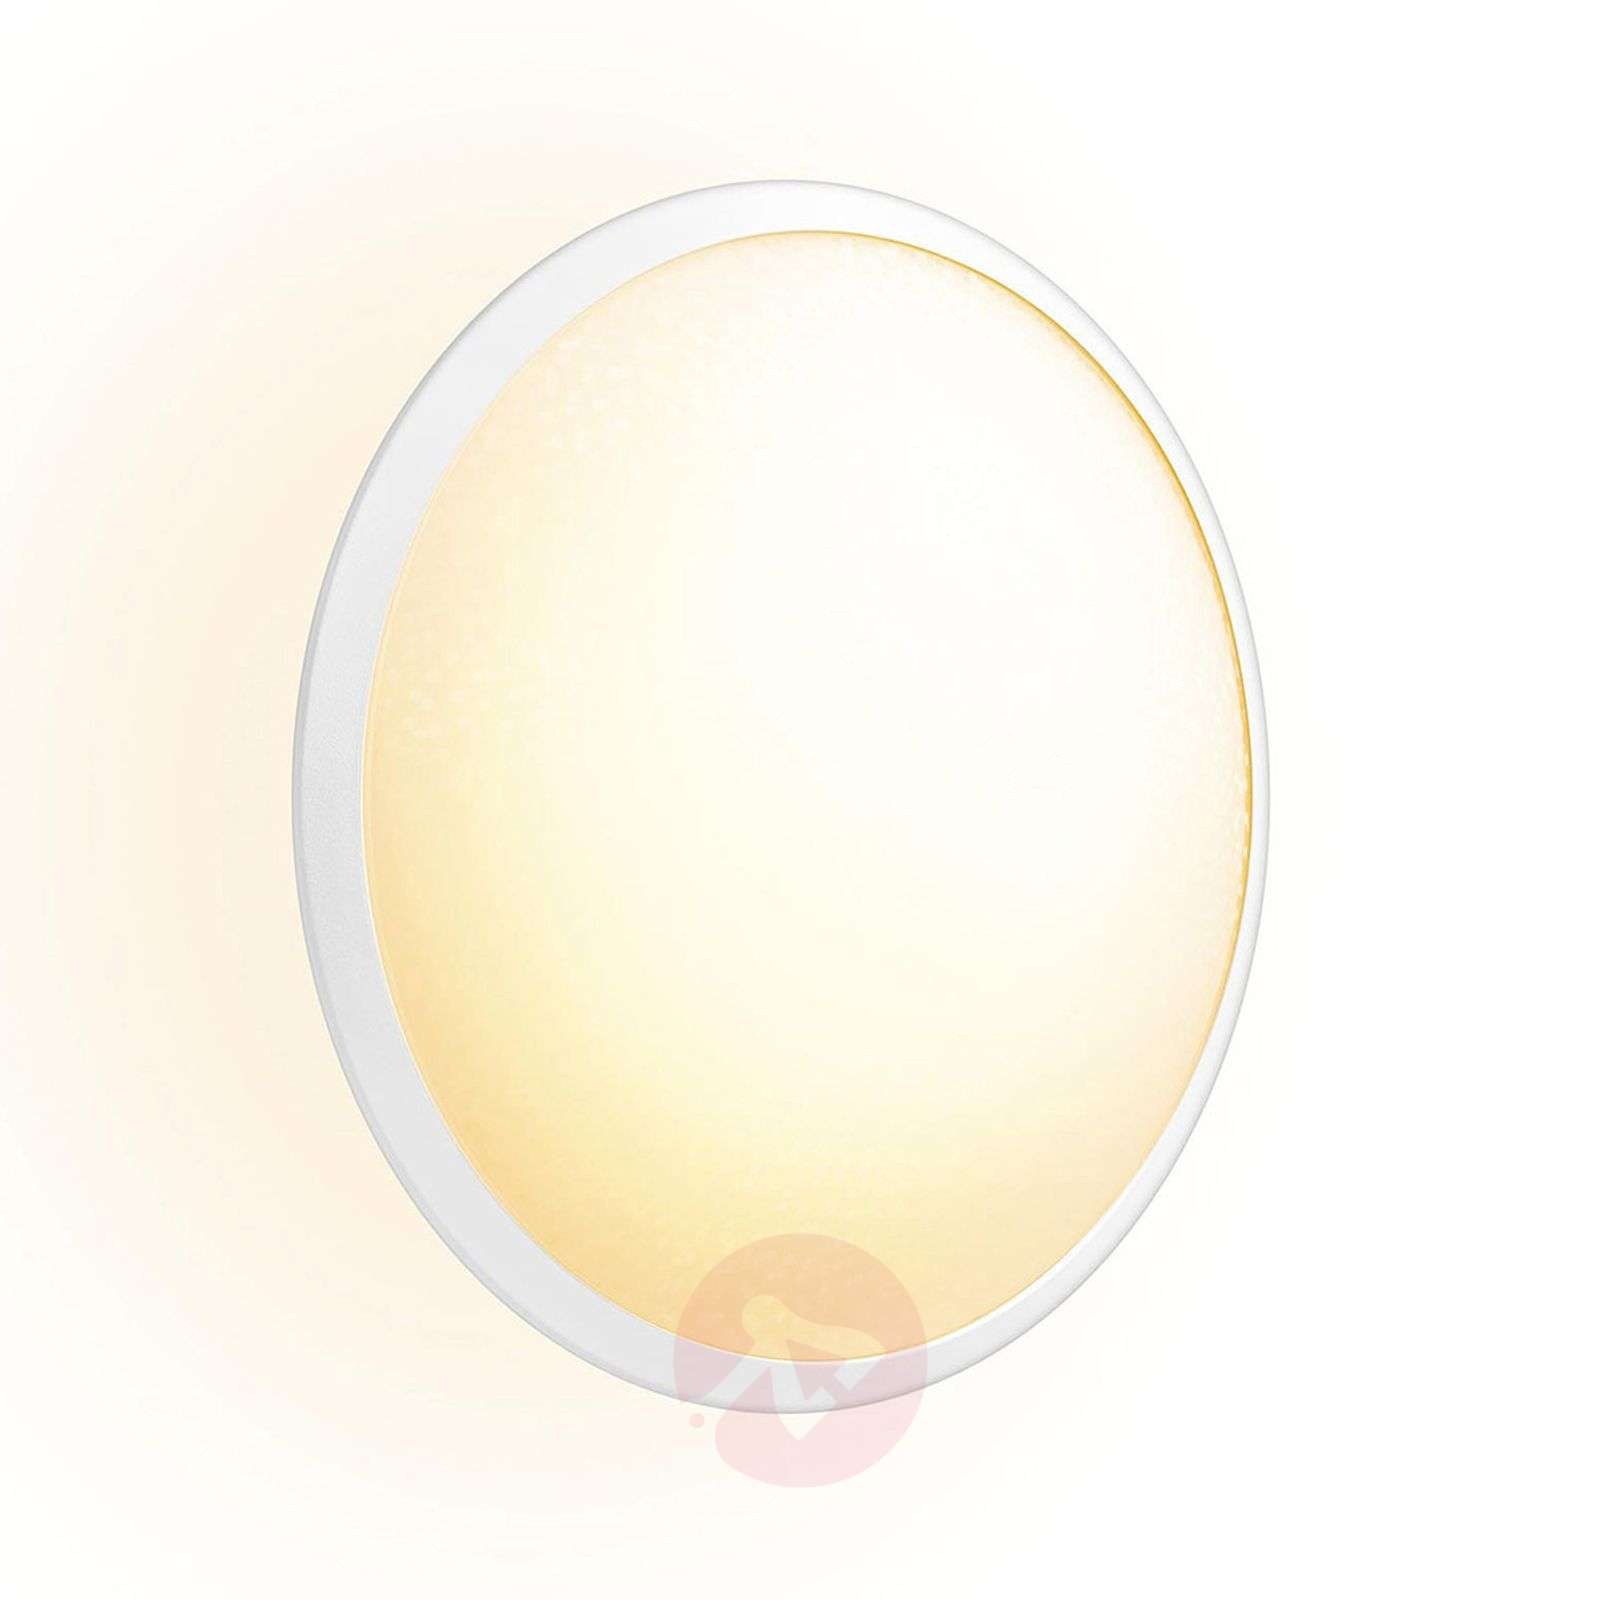 Philips Hue Phoenix LED wall light, White Ambiance-7531607-01